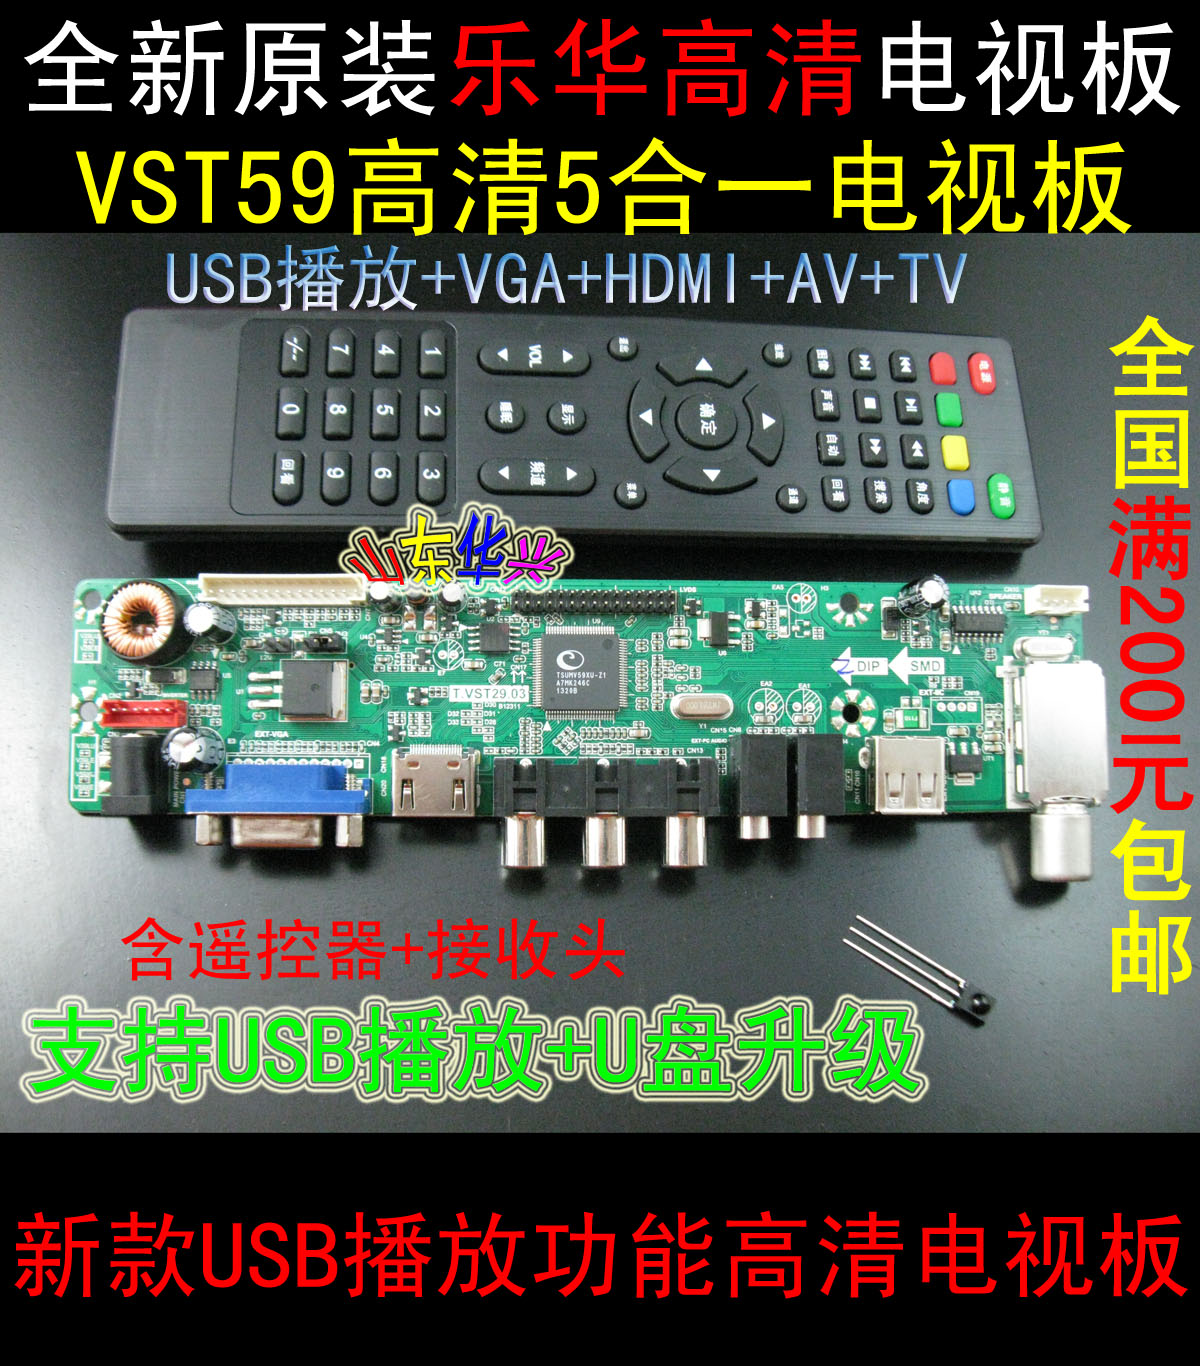 �ֻ�HDMI����V59 5��һ���Ӱ� T.VST29.03 TV��� ֧��USB����